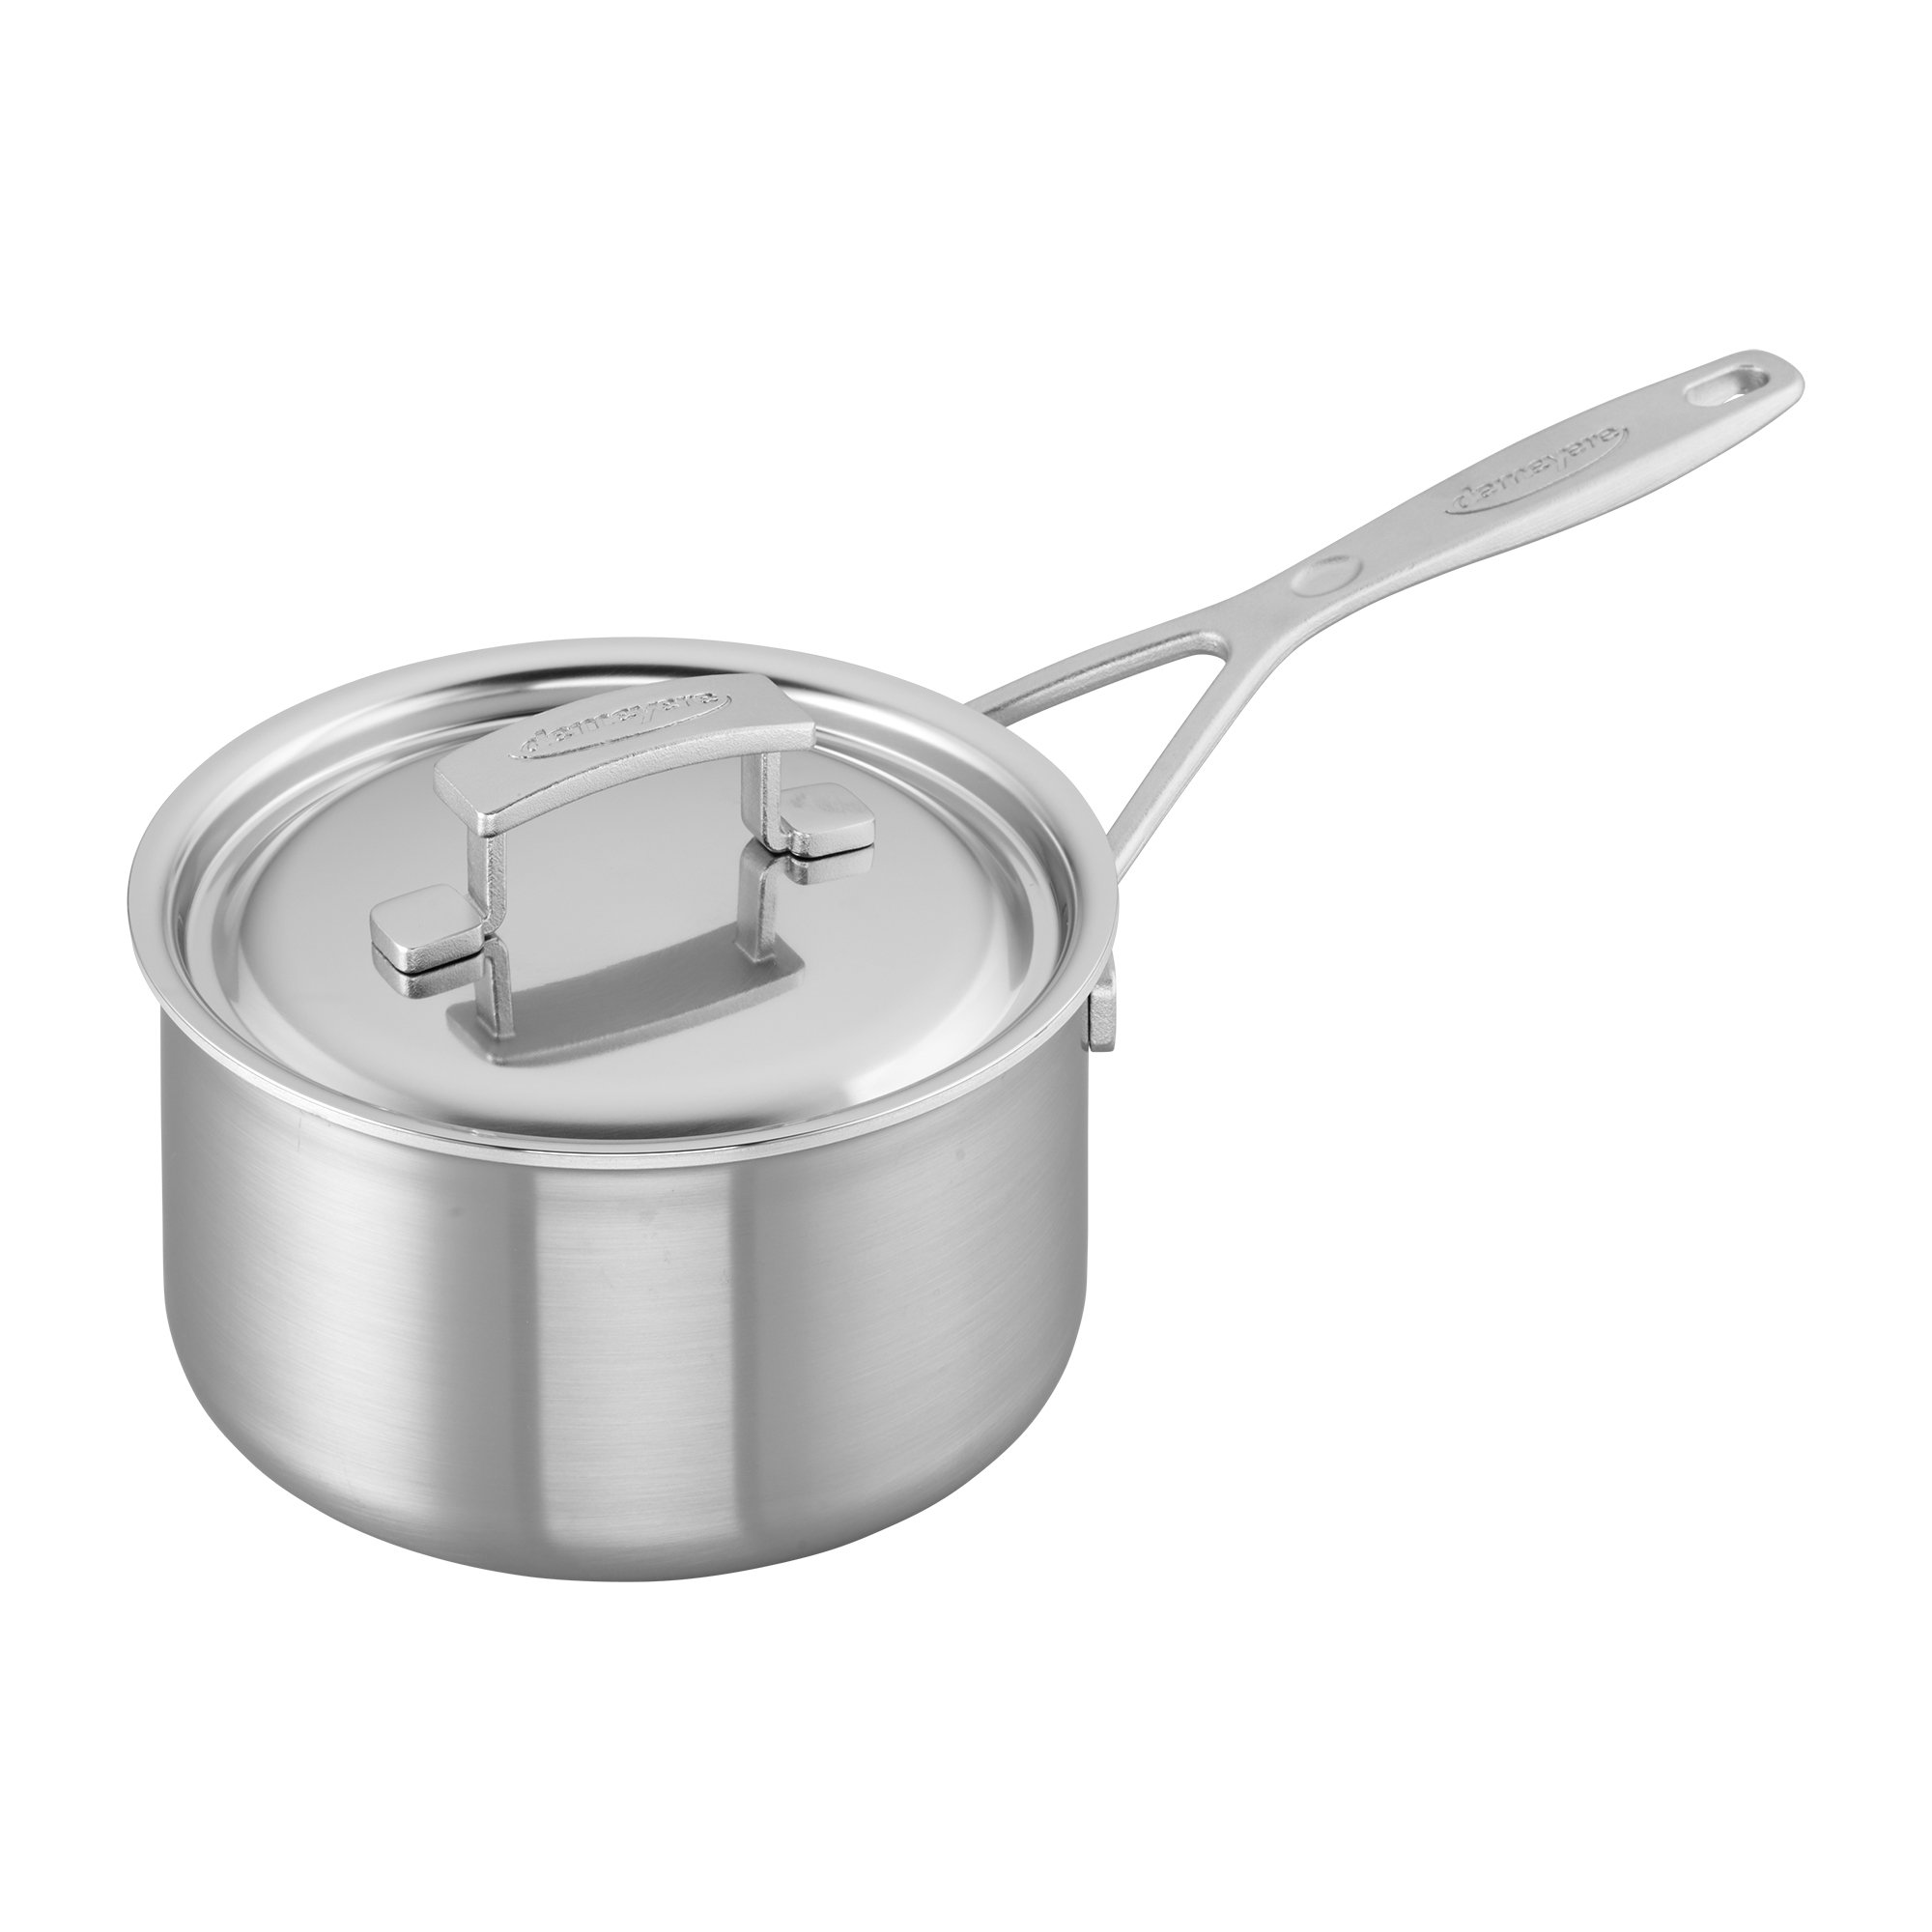 Demeyere Industry 5-Ply 2-qt Stainless Steel Saucepan